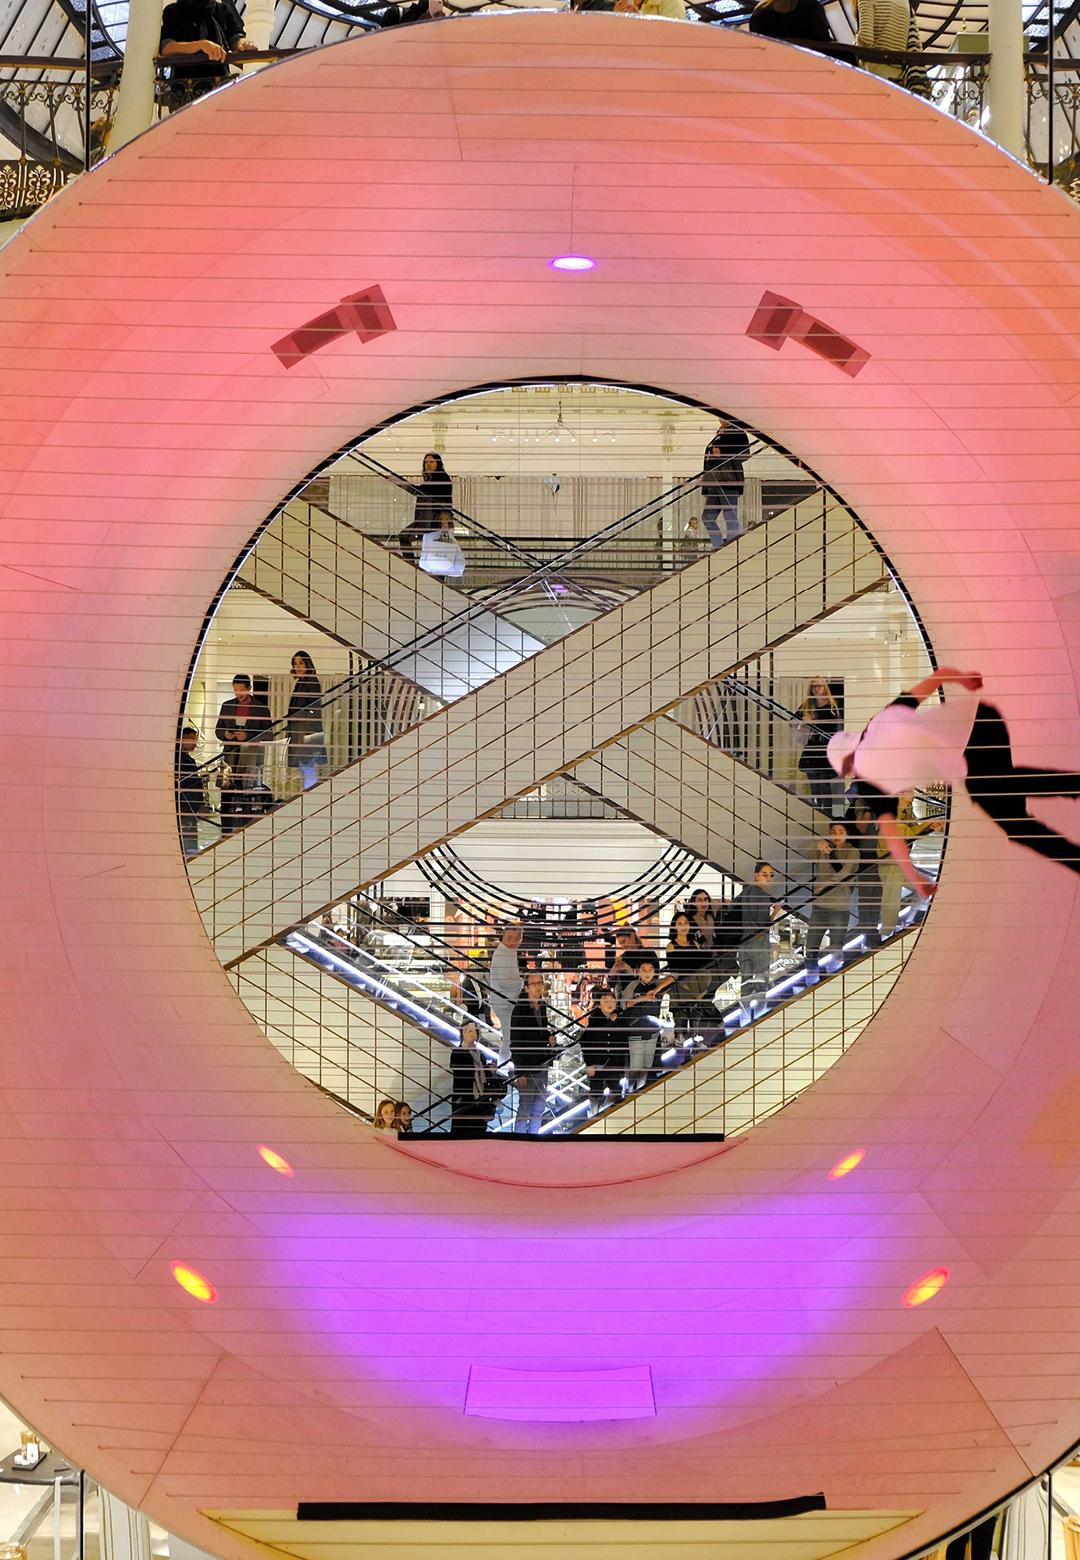 A glimpse of the winning Interiors projects at Dezeen Awards 2019 | Dezeen Awards 2019 | STIRworld